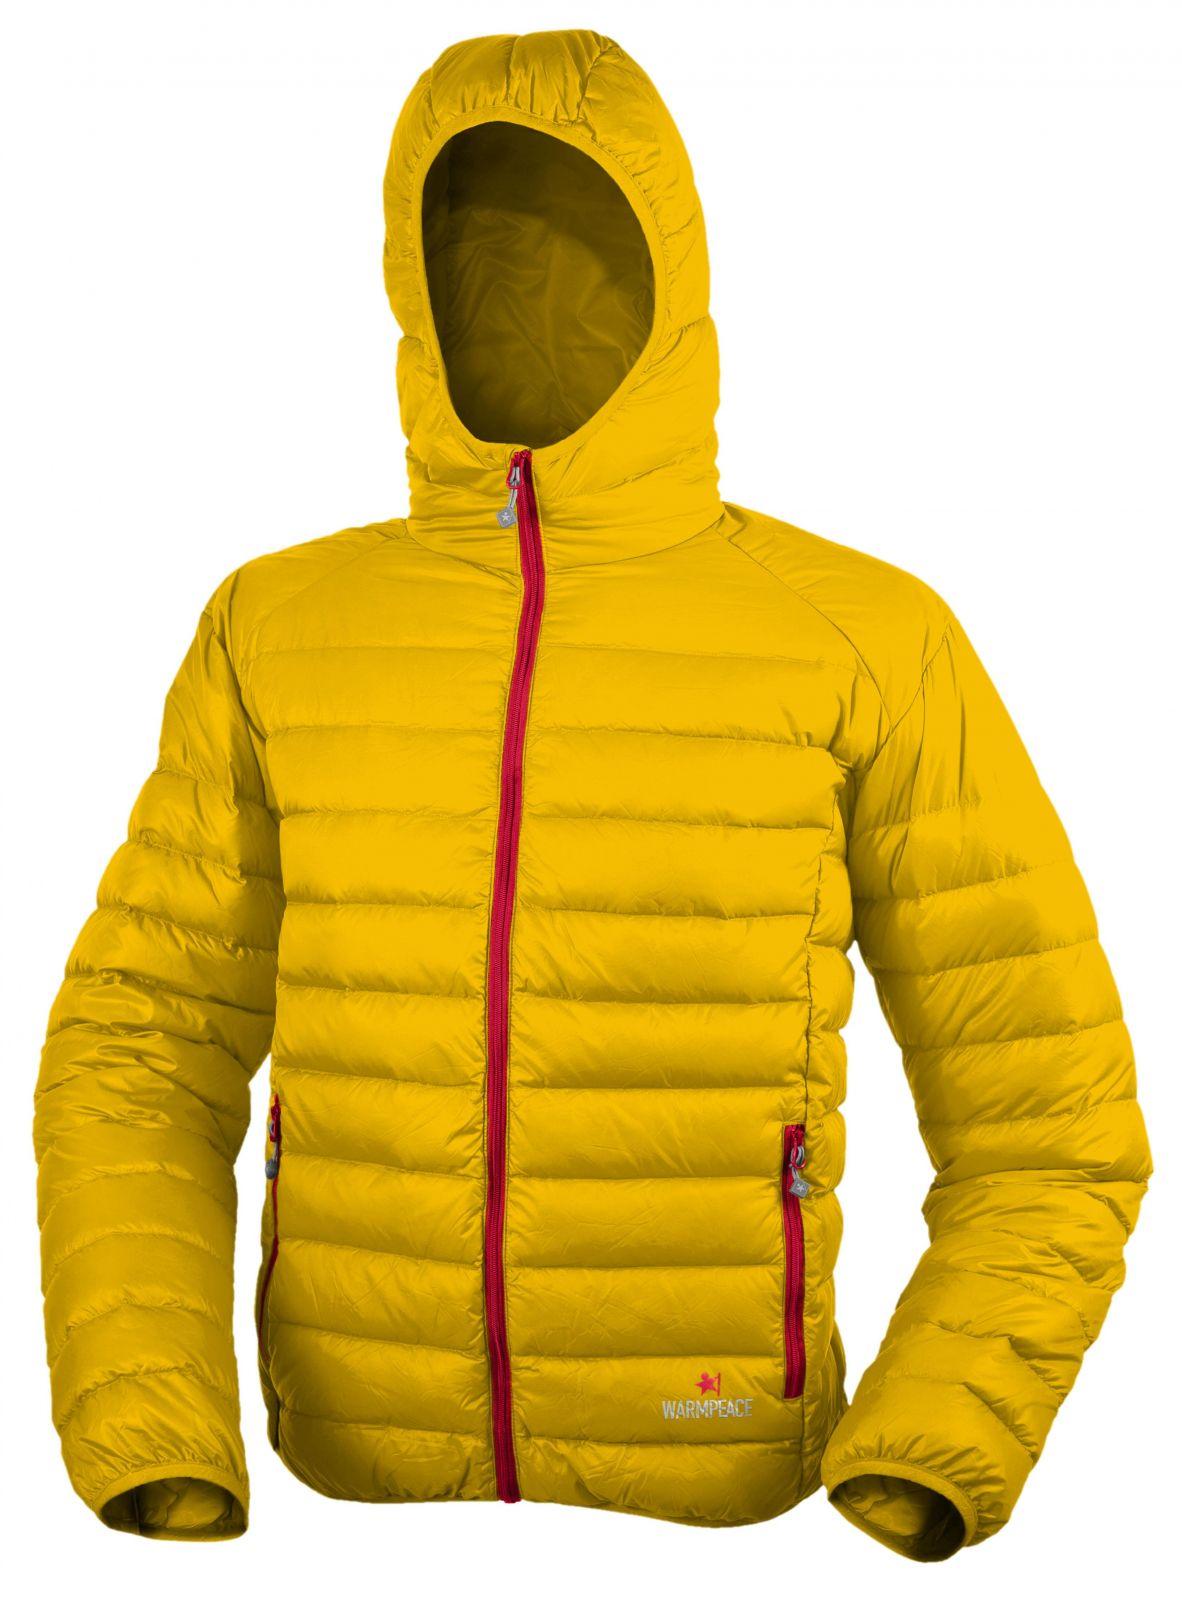 Warmpeace Nordvik lemon / red péřová bunda